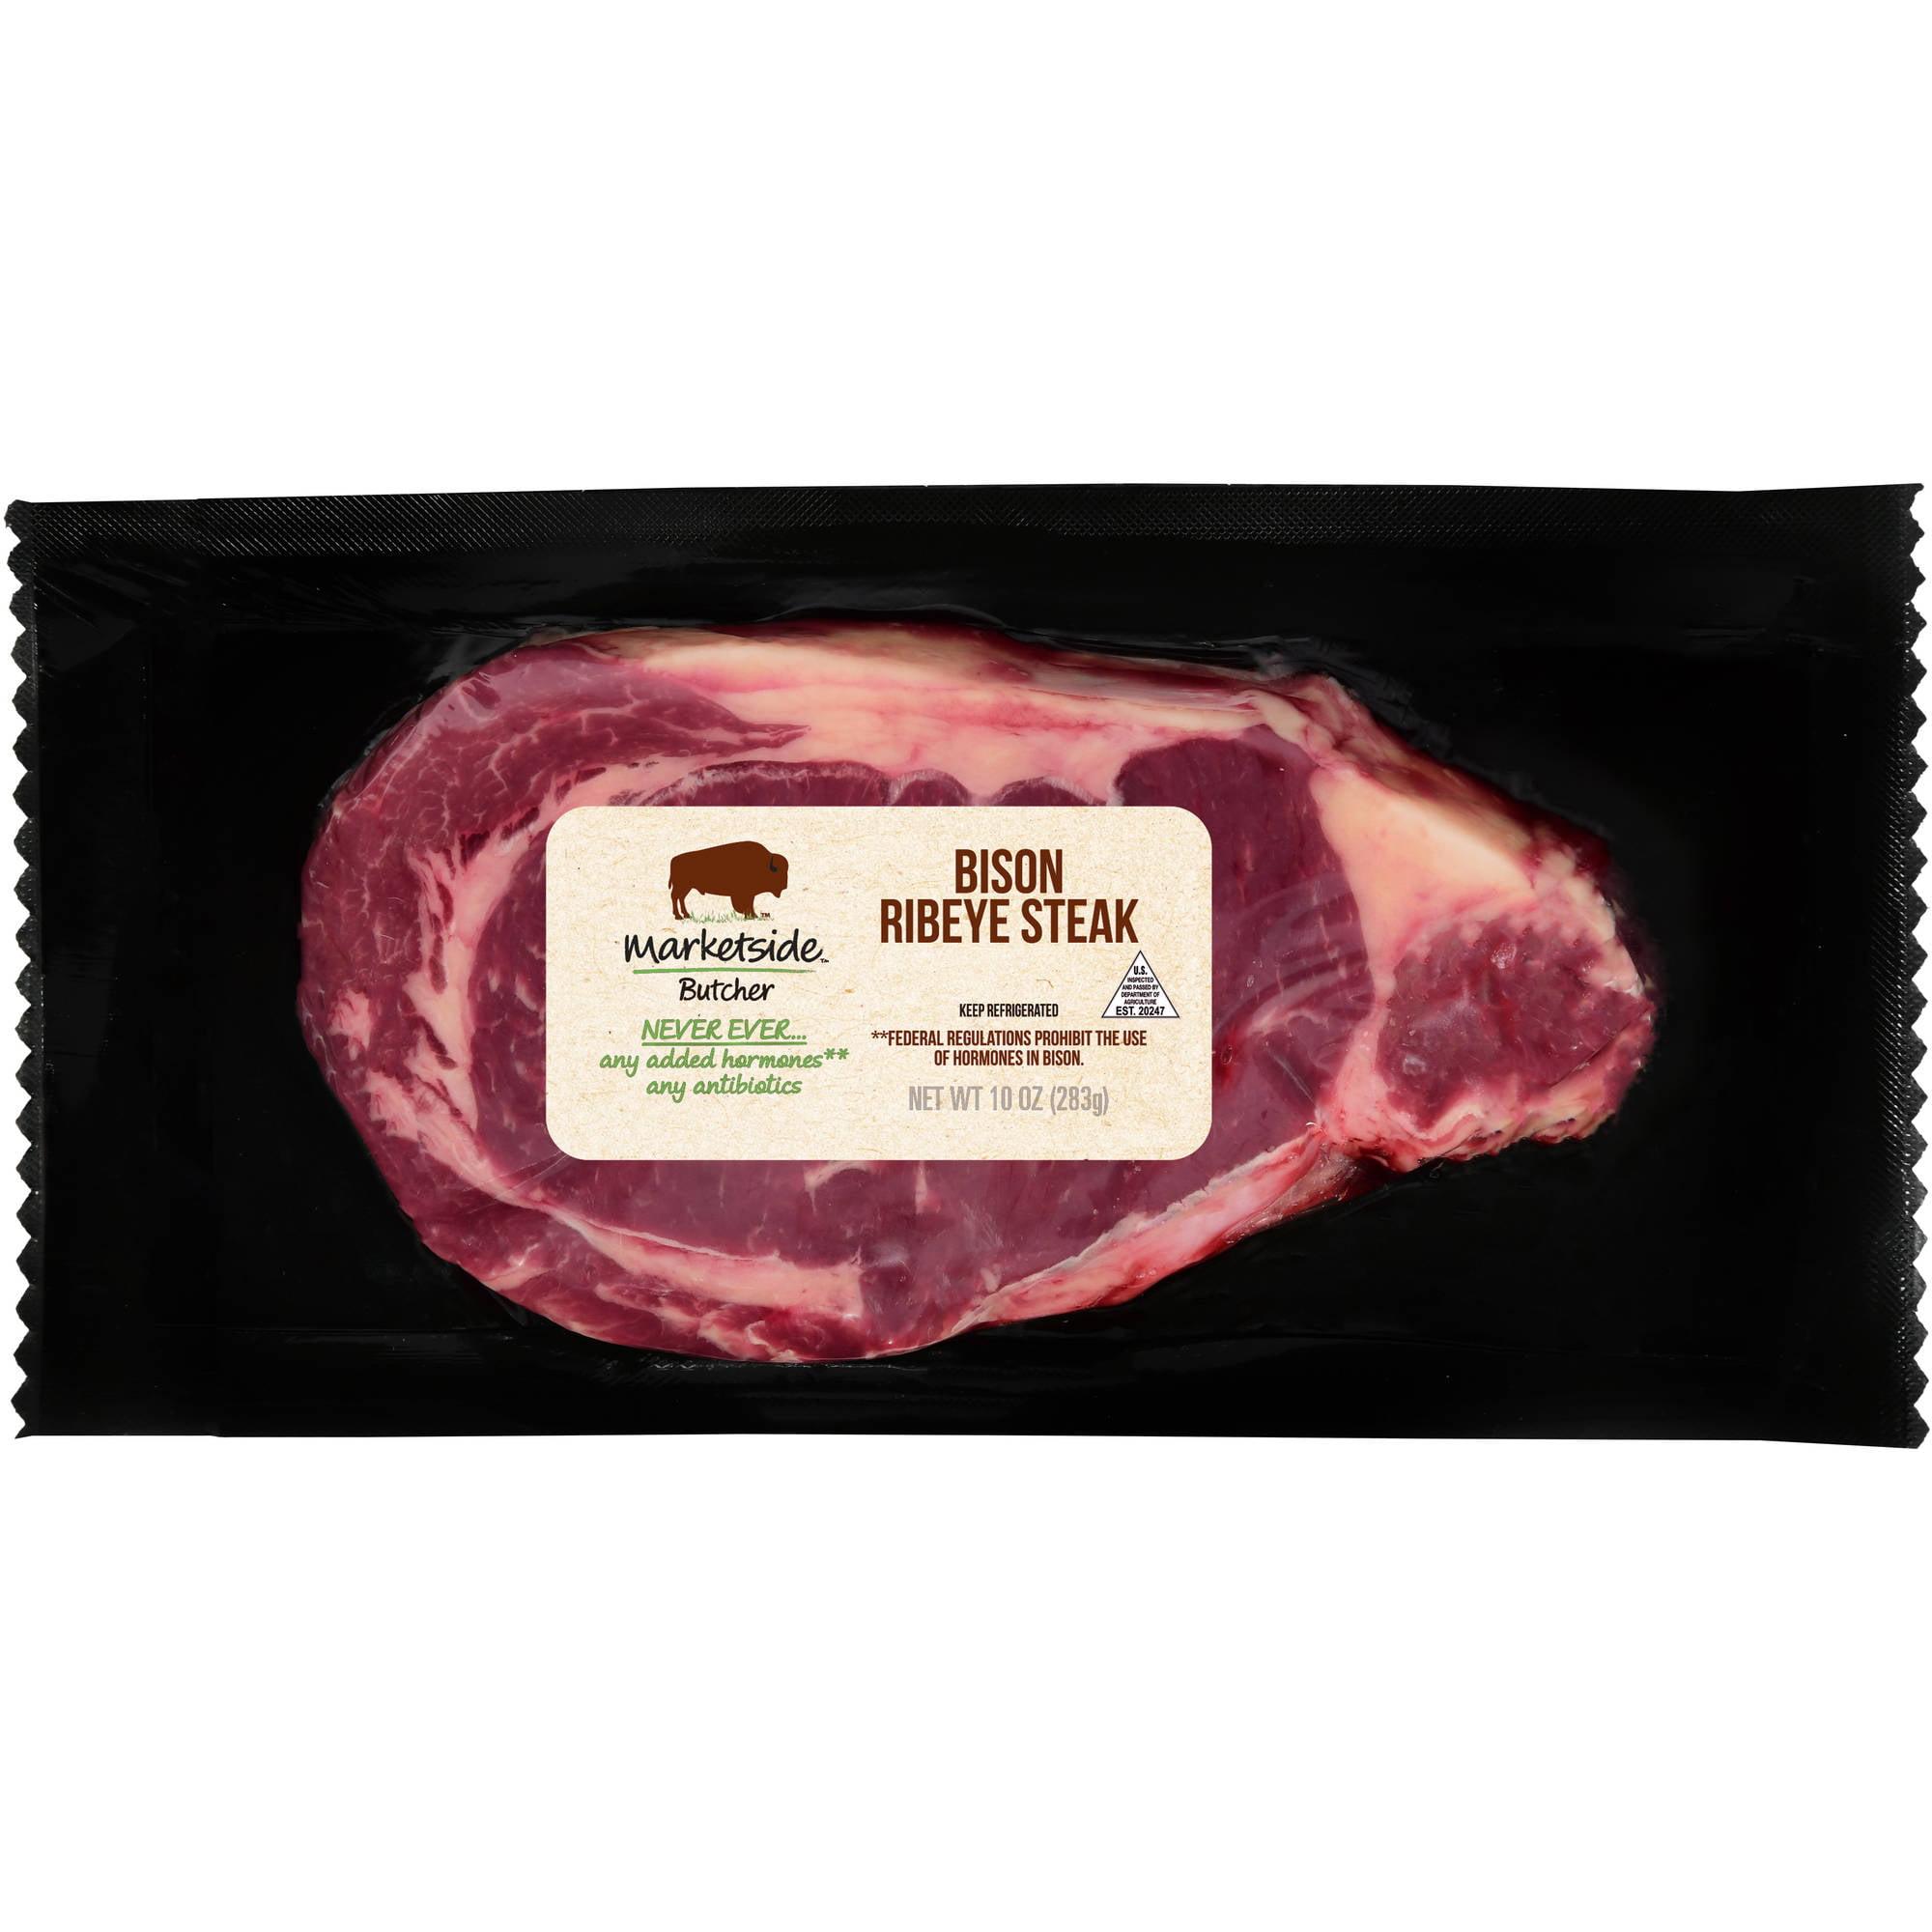 Marketside Butcher Bison Ribeye Steak 10oz